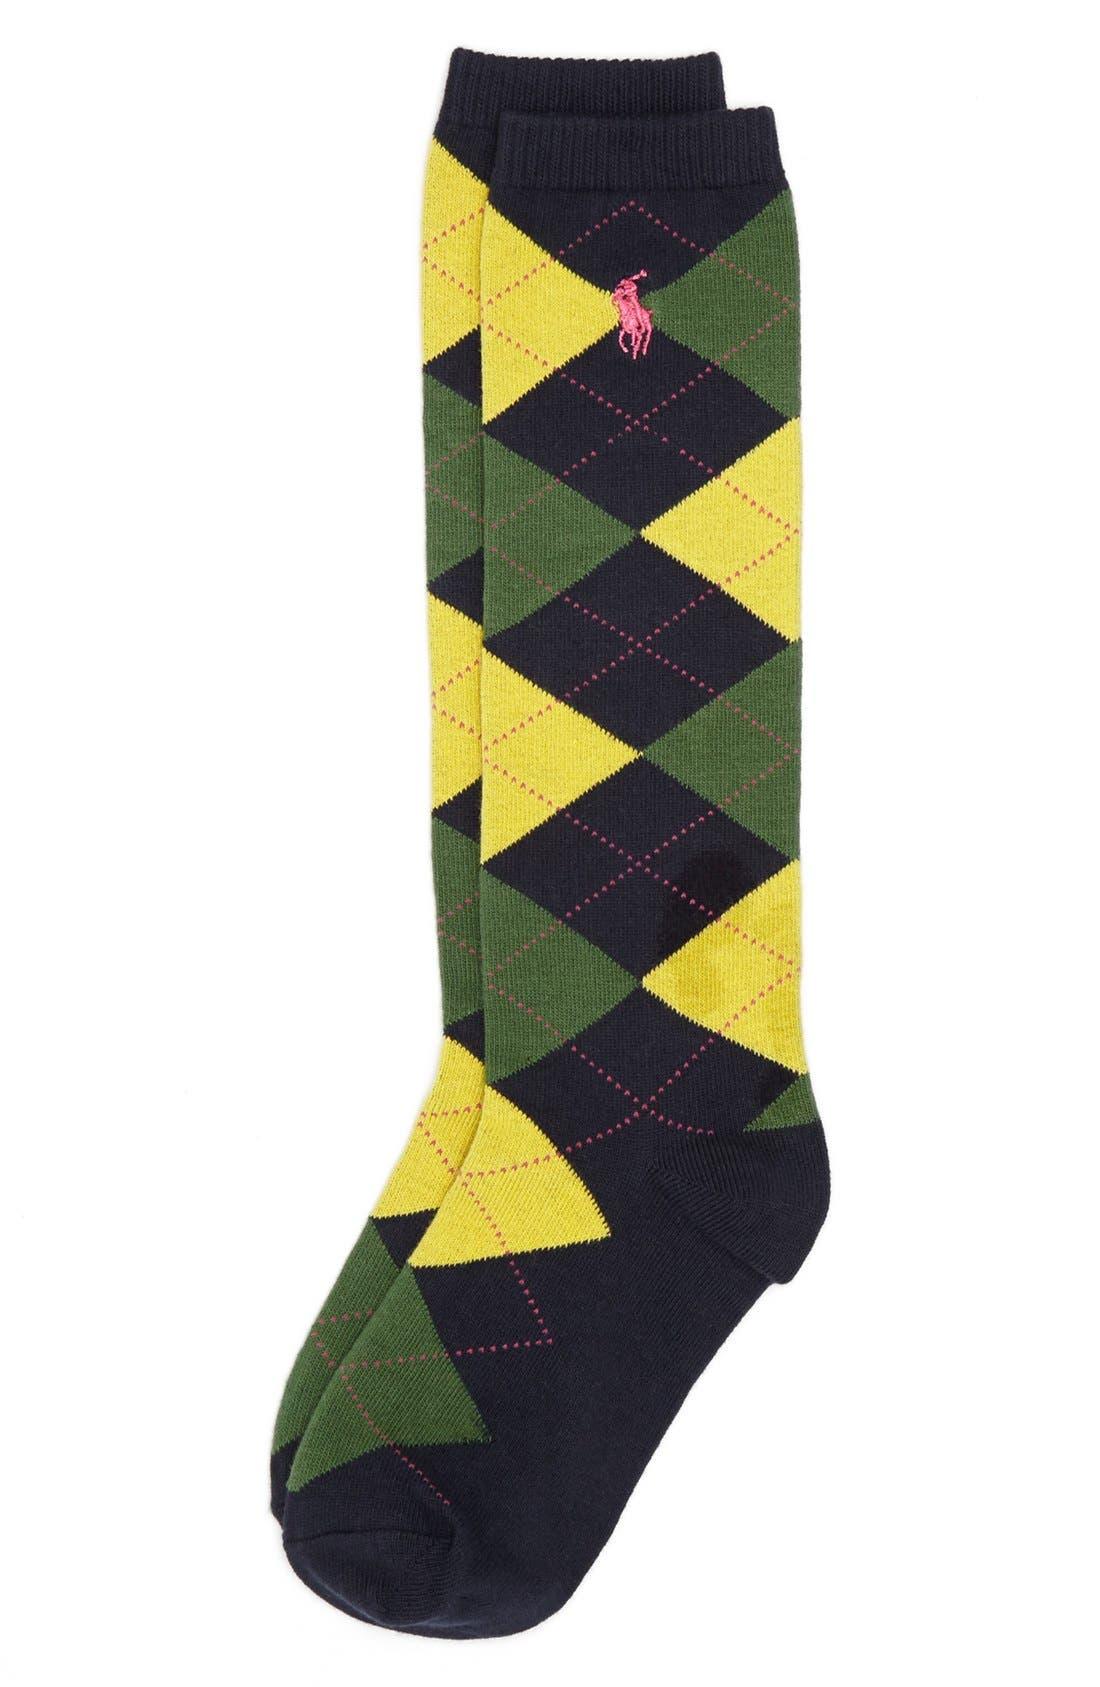 Alternate Image 1 Selected - Polo Ralph Lauren Argyle Knee High Socks (Big Kids)